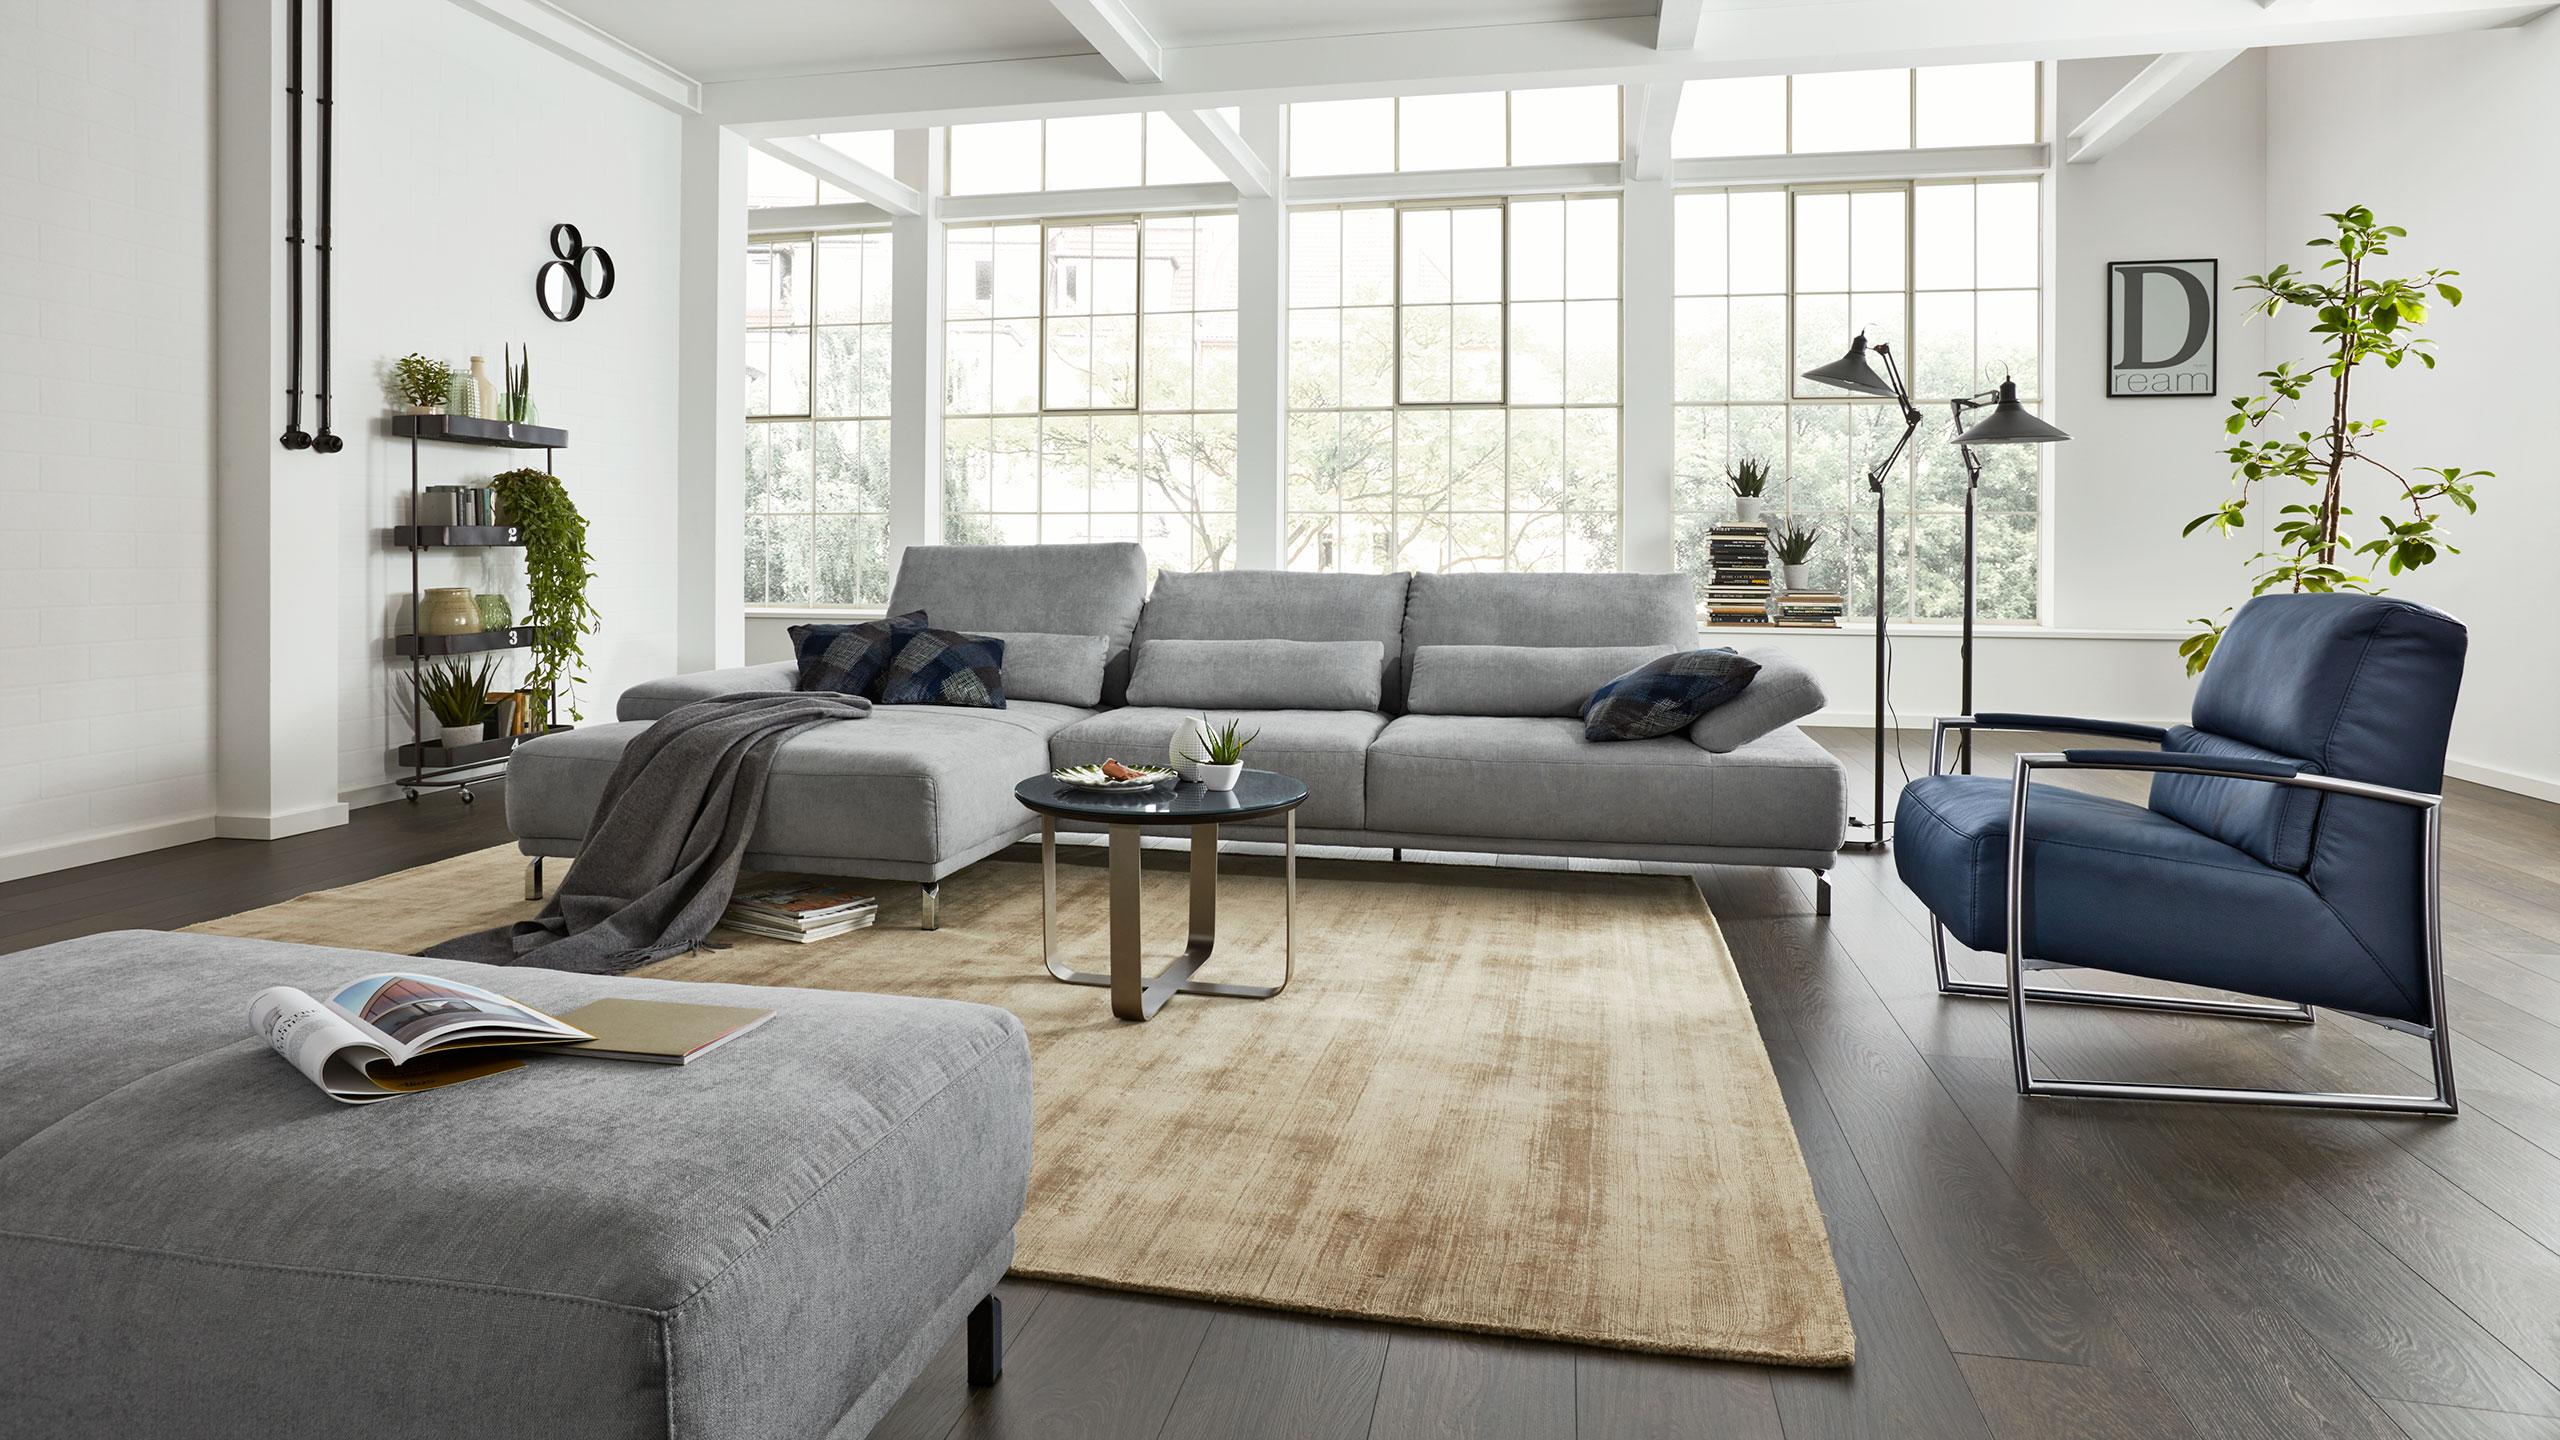 Interliving-Sofa-Serie-4150-Sessel-Sofa-grau